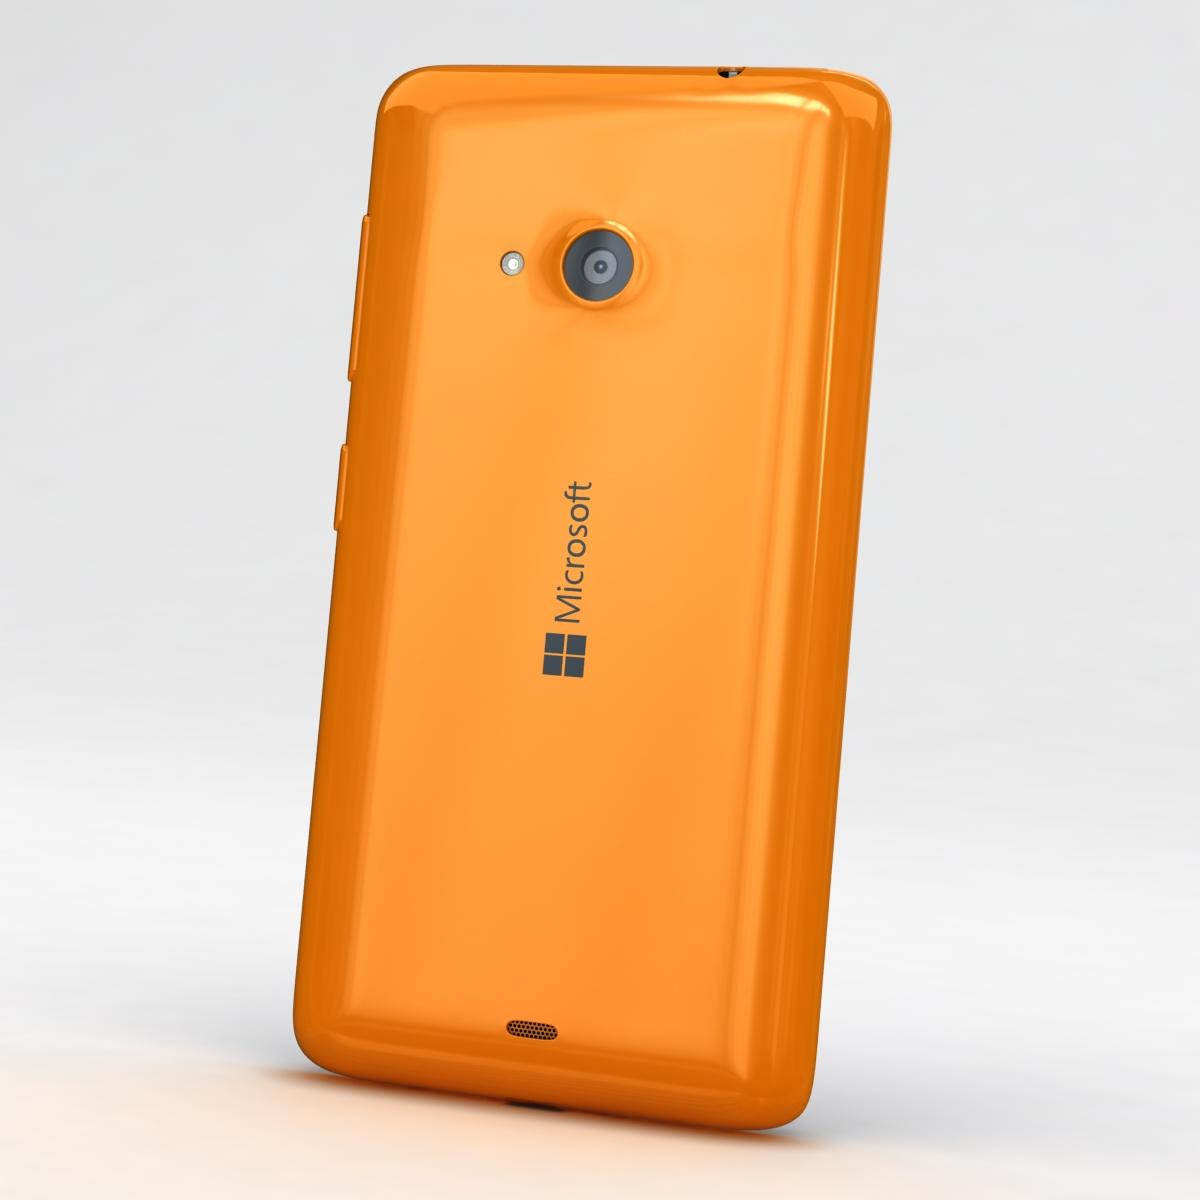 microsoft lumia 535 and dual sim orange 3d model 3ds max fbx c4d obj 204107